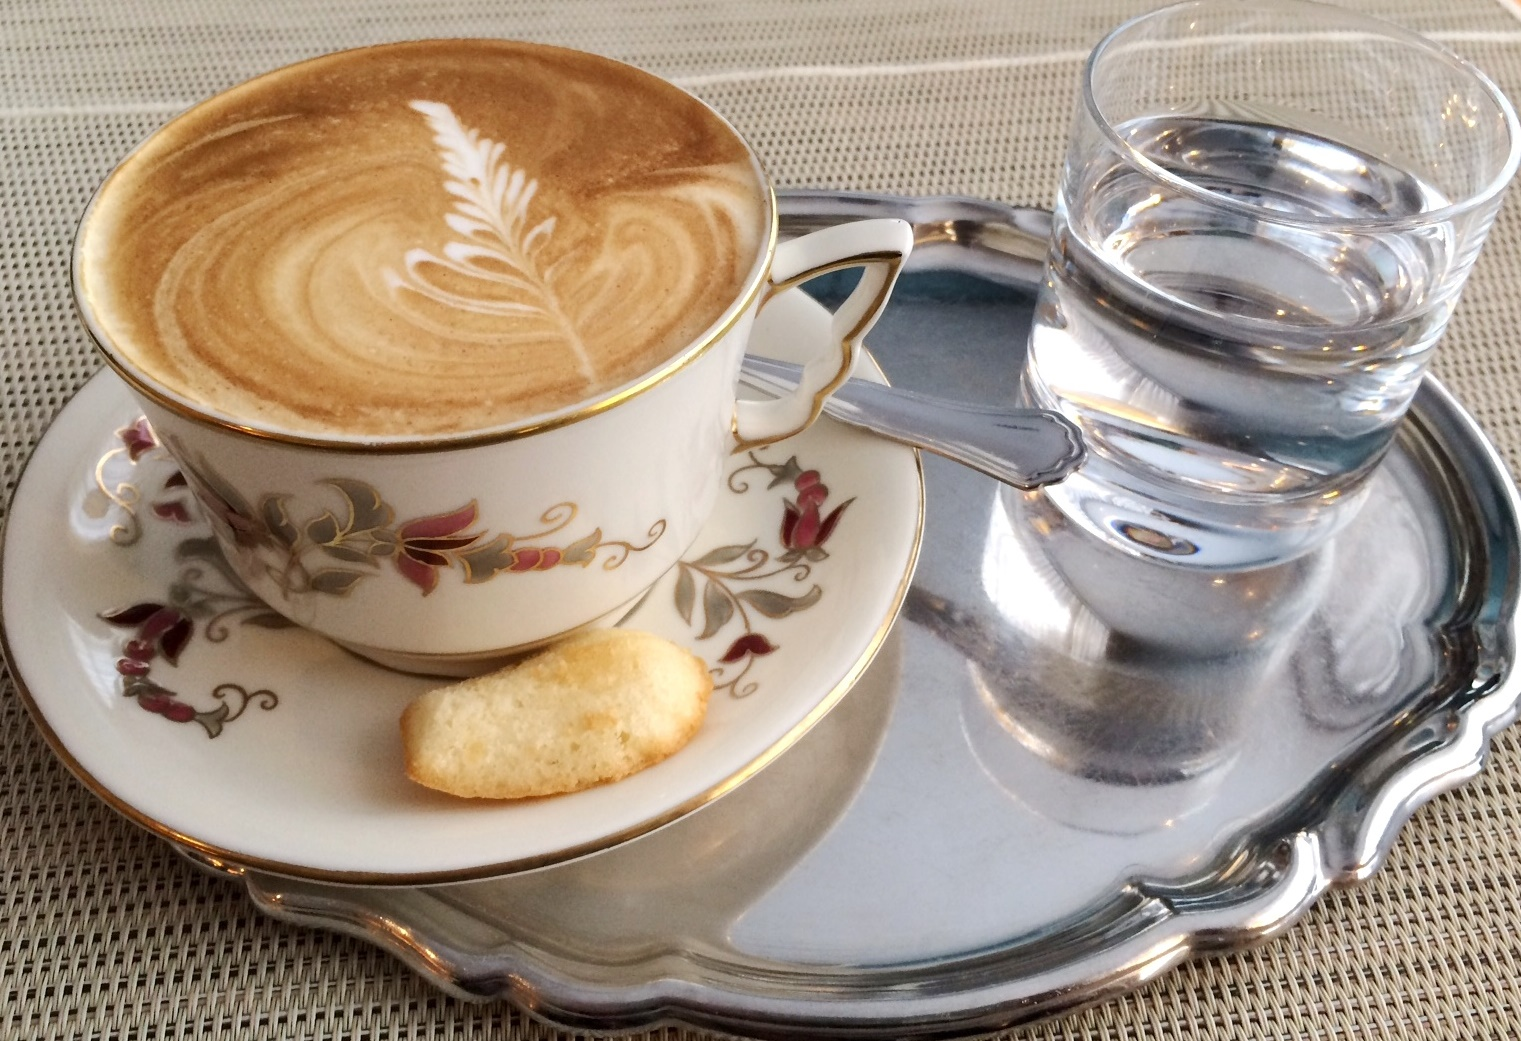 cappuccino2.jpg